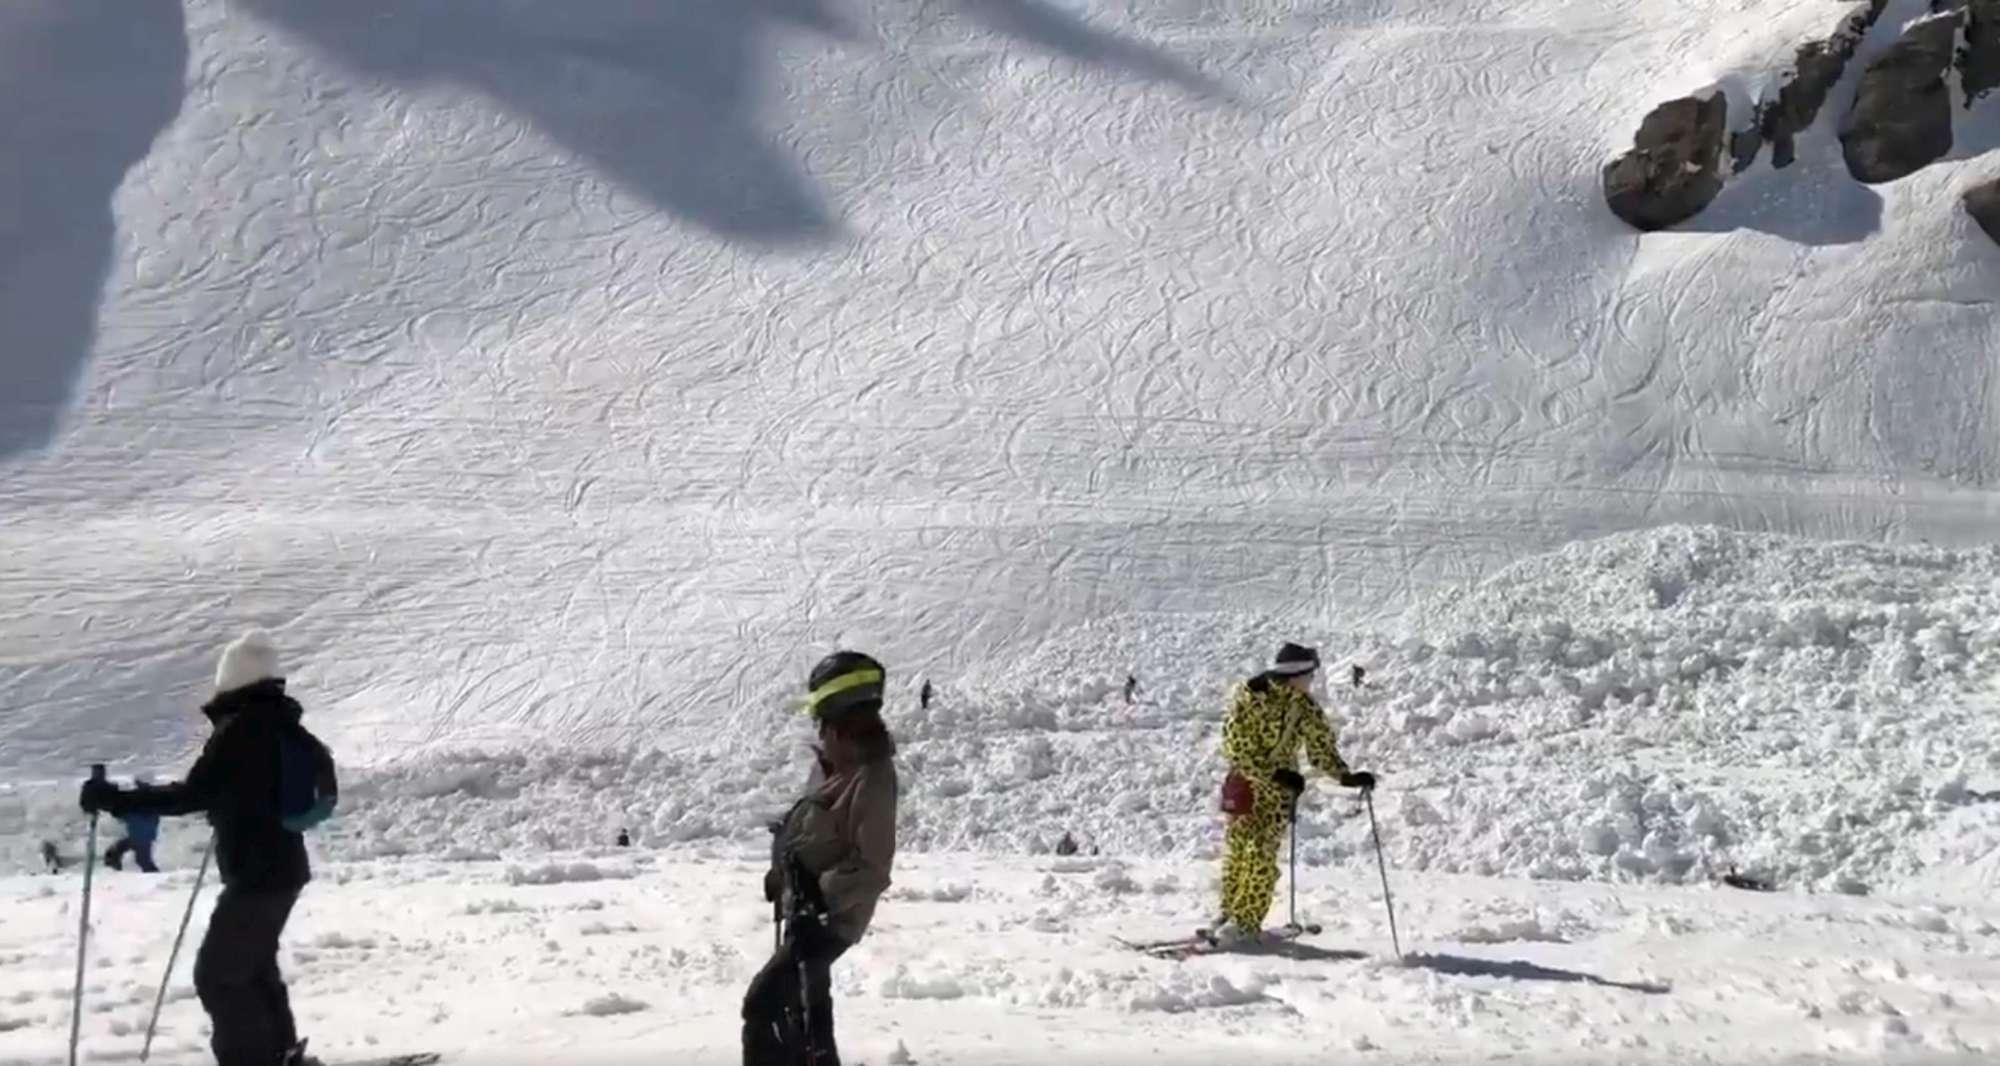 Valanga su una pista da sci in Svizzera: diverse persone travolte